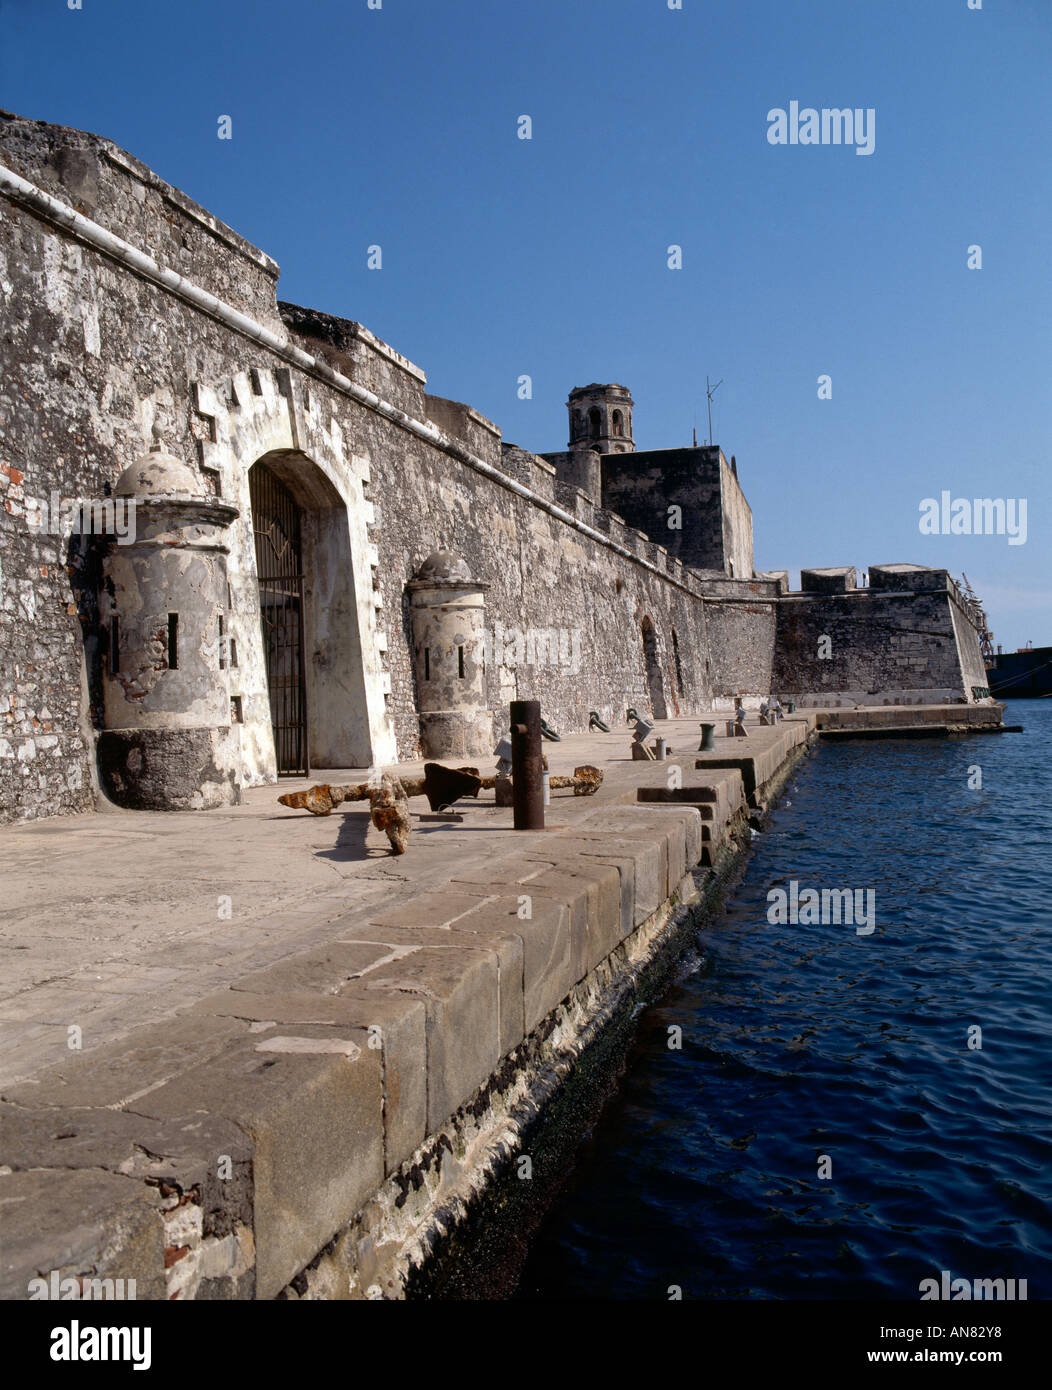 Looking along the fortified walls of the fortress of San Juan de Ulua Veracruz rebuilt and strengthened in 1746 Stock Photo